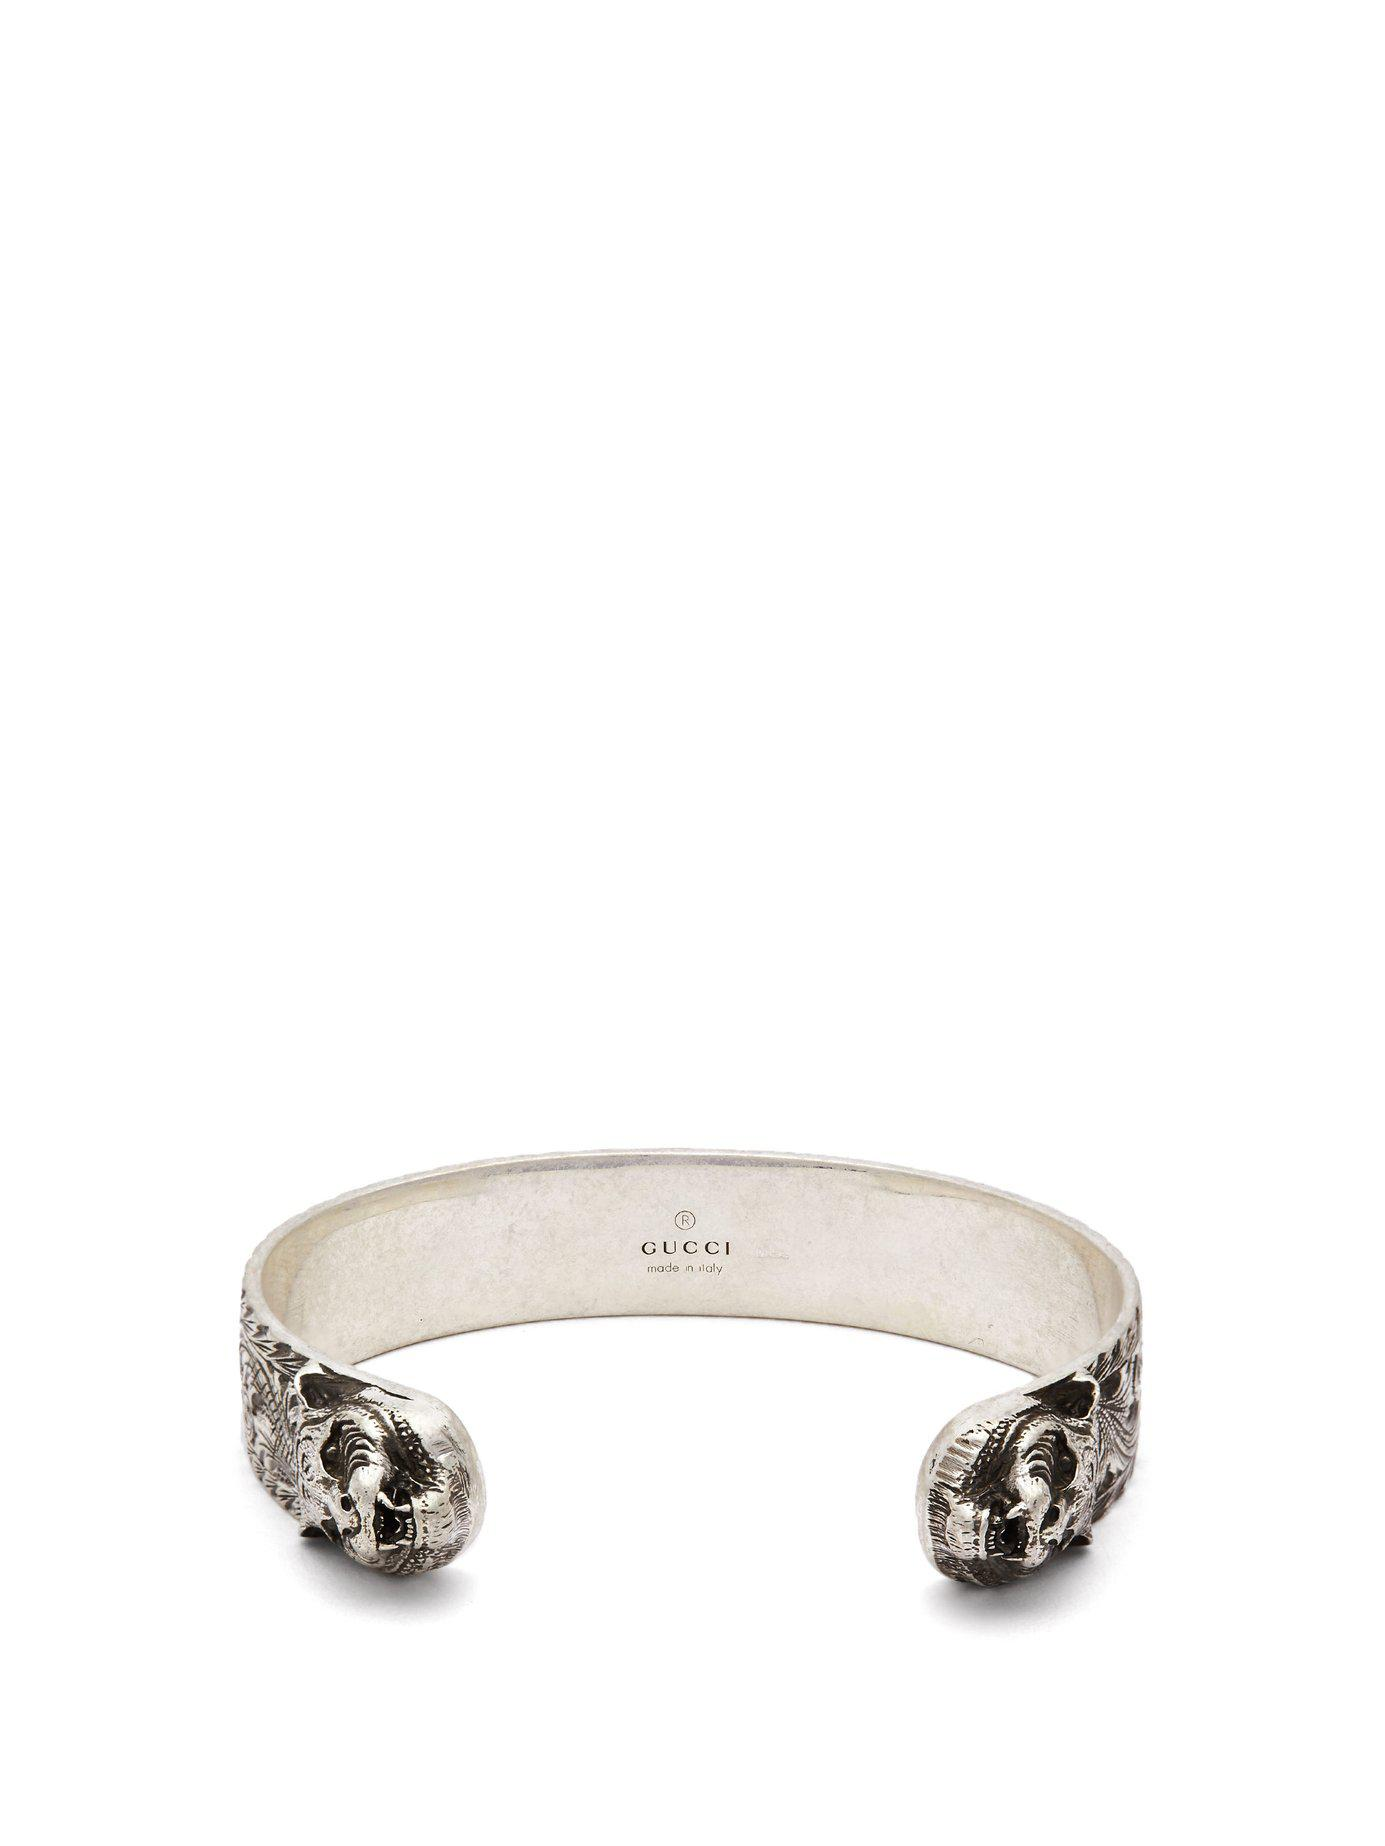 018c014bd Tap to visit site. Gucci Metallic Tiger Head Sterling Silver Cuff Bracelet  for men